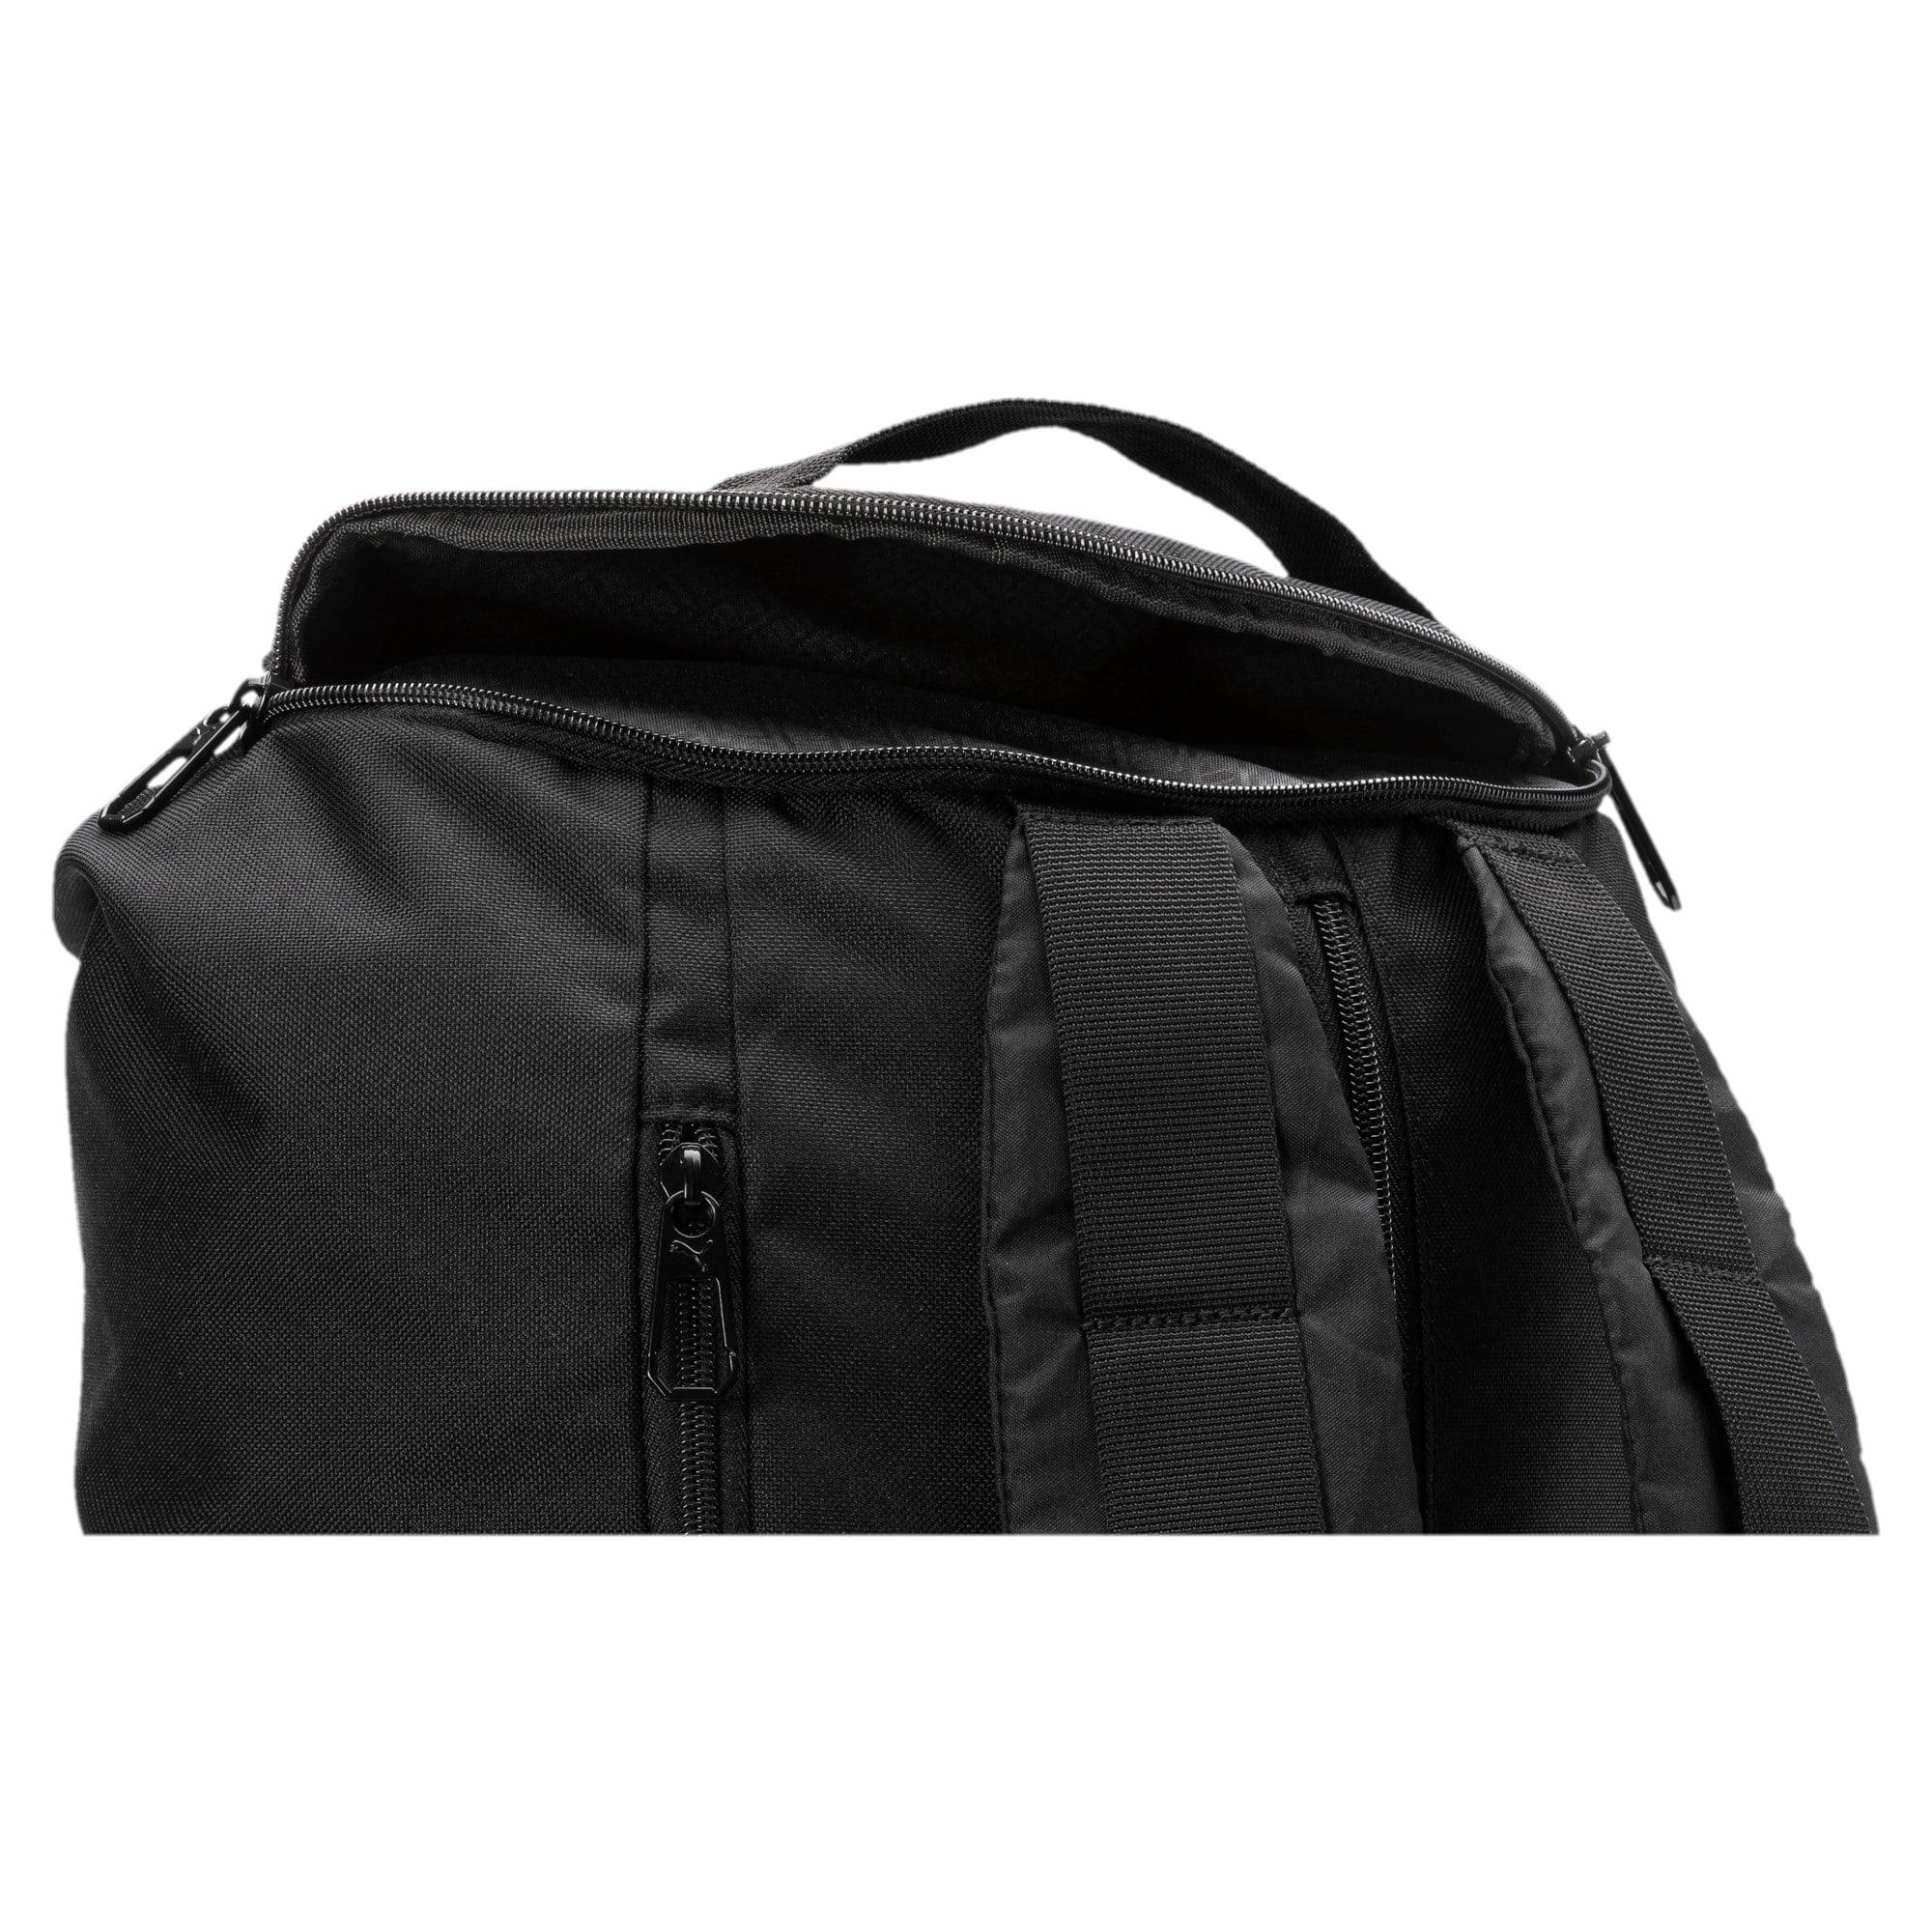 Thumbnail 5 of Training Transform Duffle Bag, Puma Black, medium-IND